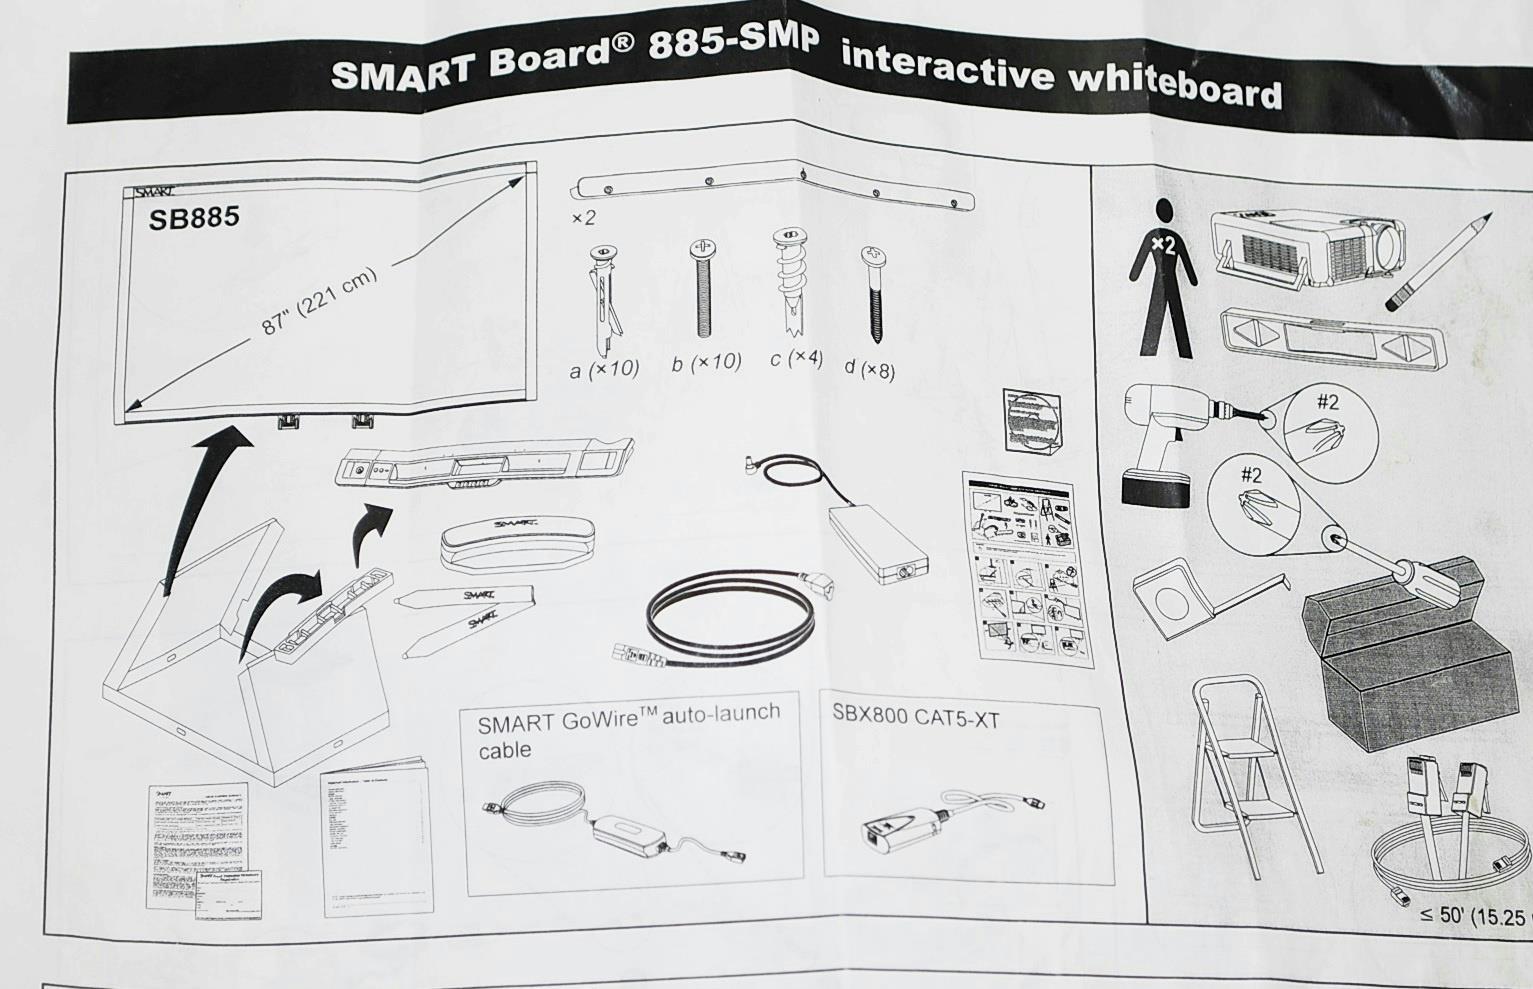 Smartboard 885 Wiring Diagram Libraries Cm Schematic Todayssmartboard Diagrams Schema Mobile Smart